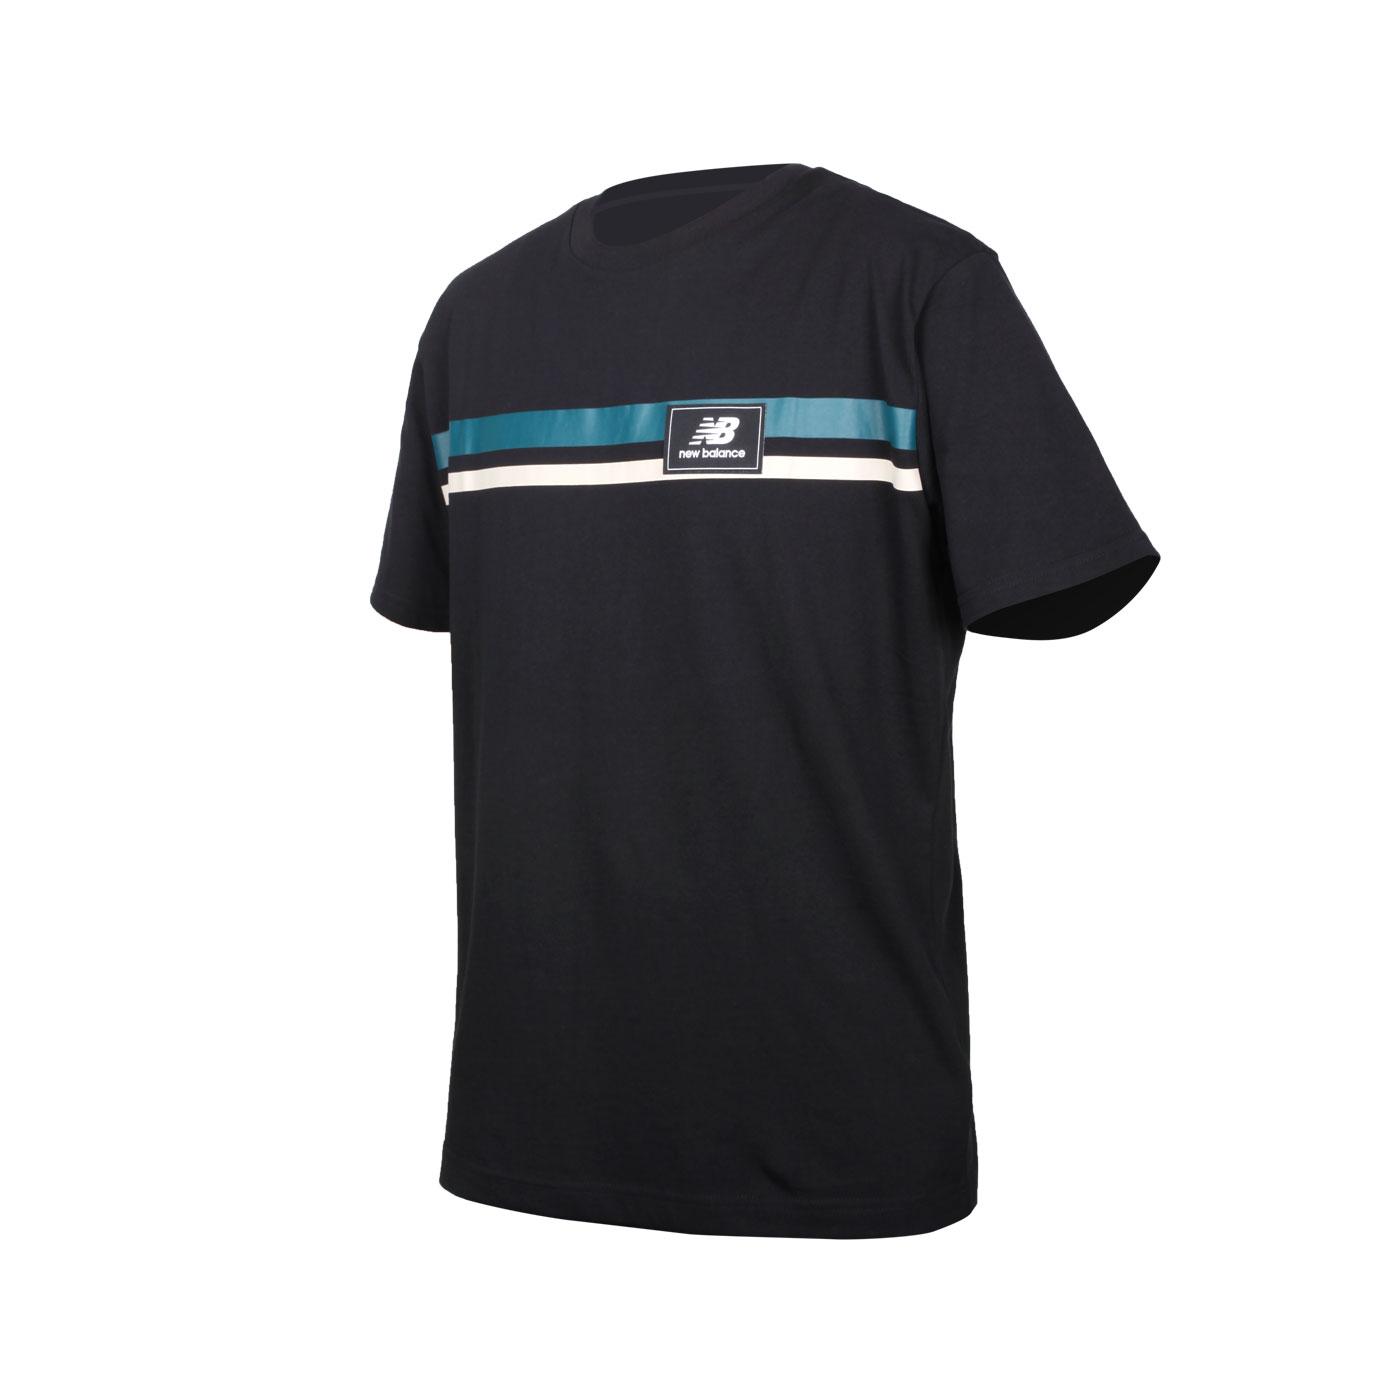 NEW BALANCE 男款短袖T恤 MT13501BK - 黑綠灰